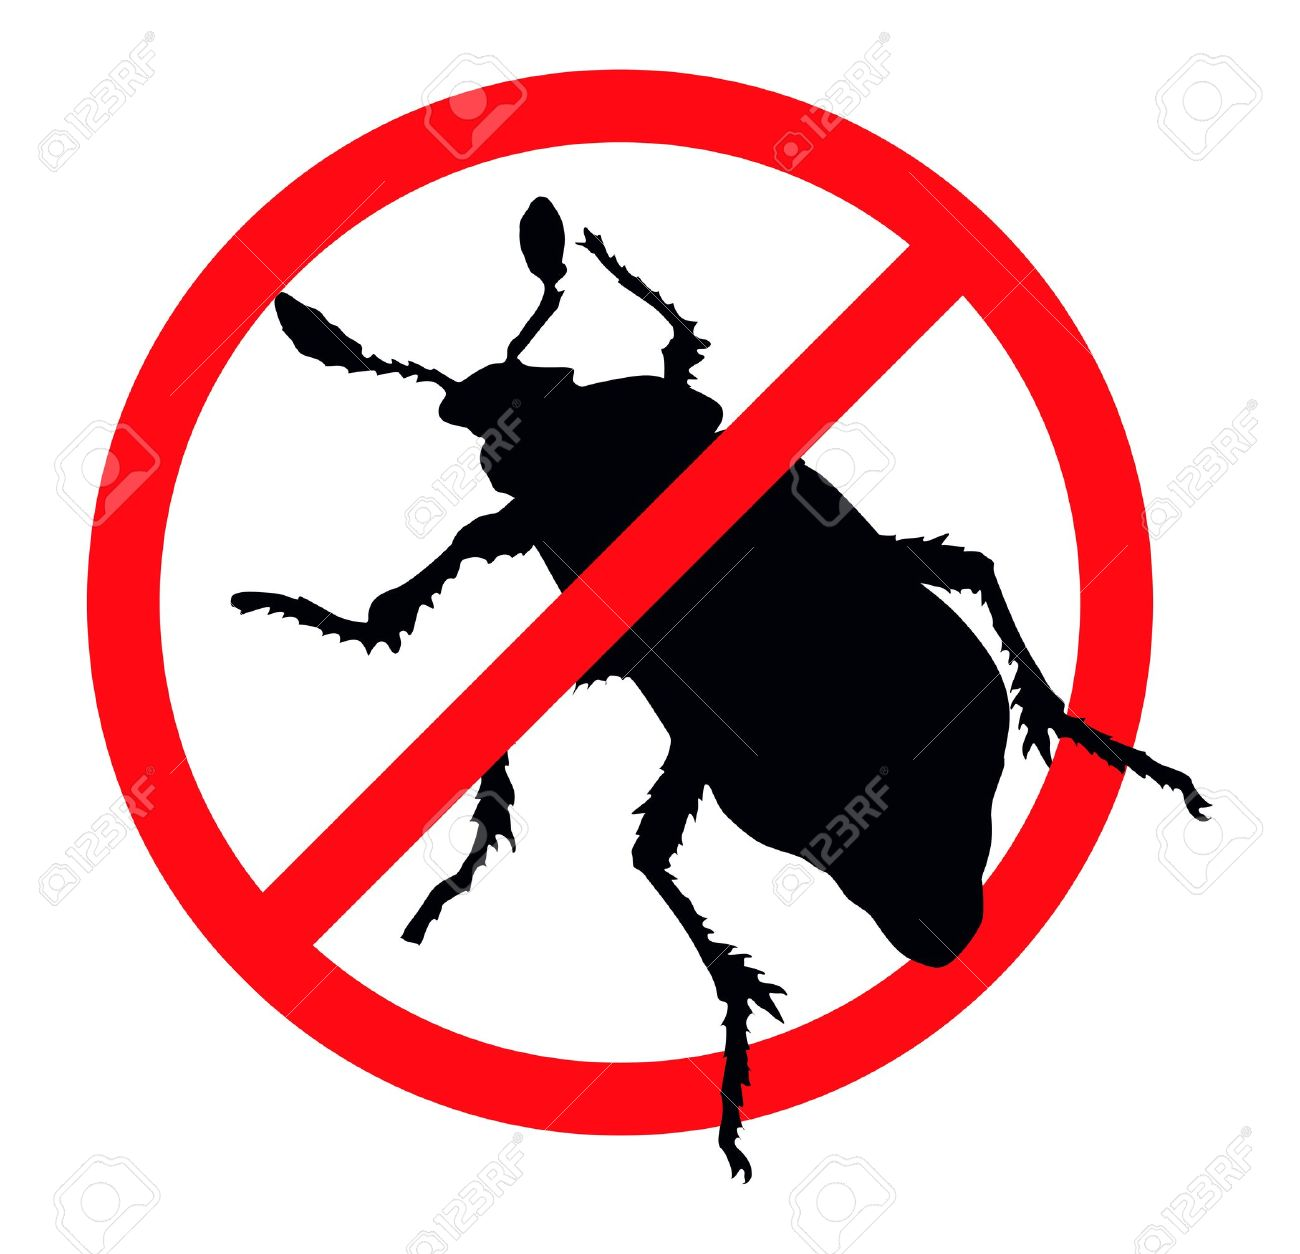 Pest Control Clipart.